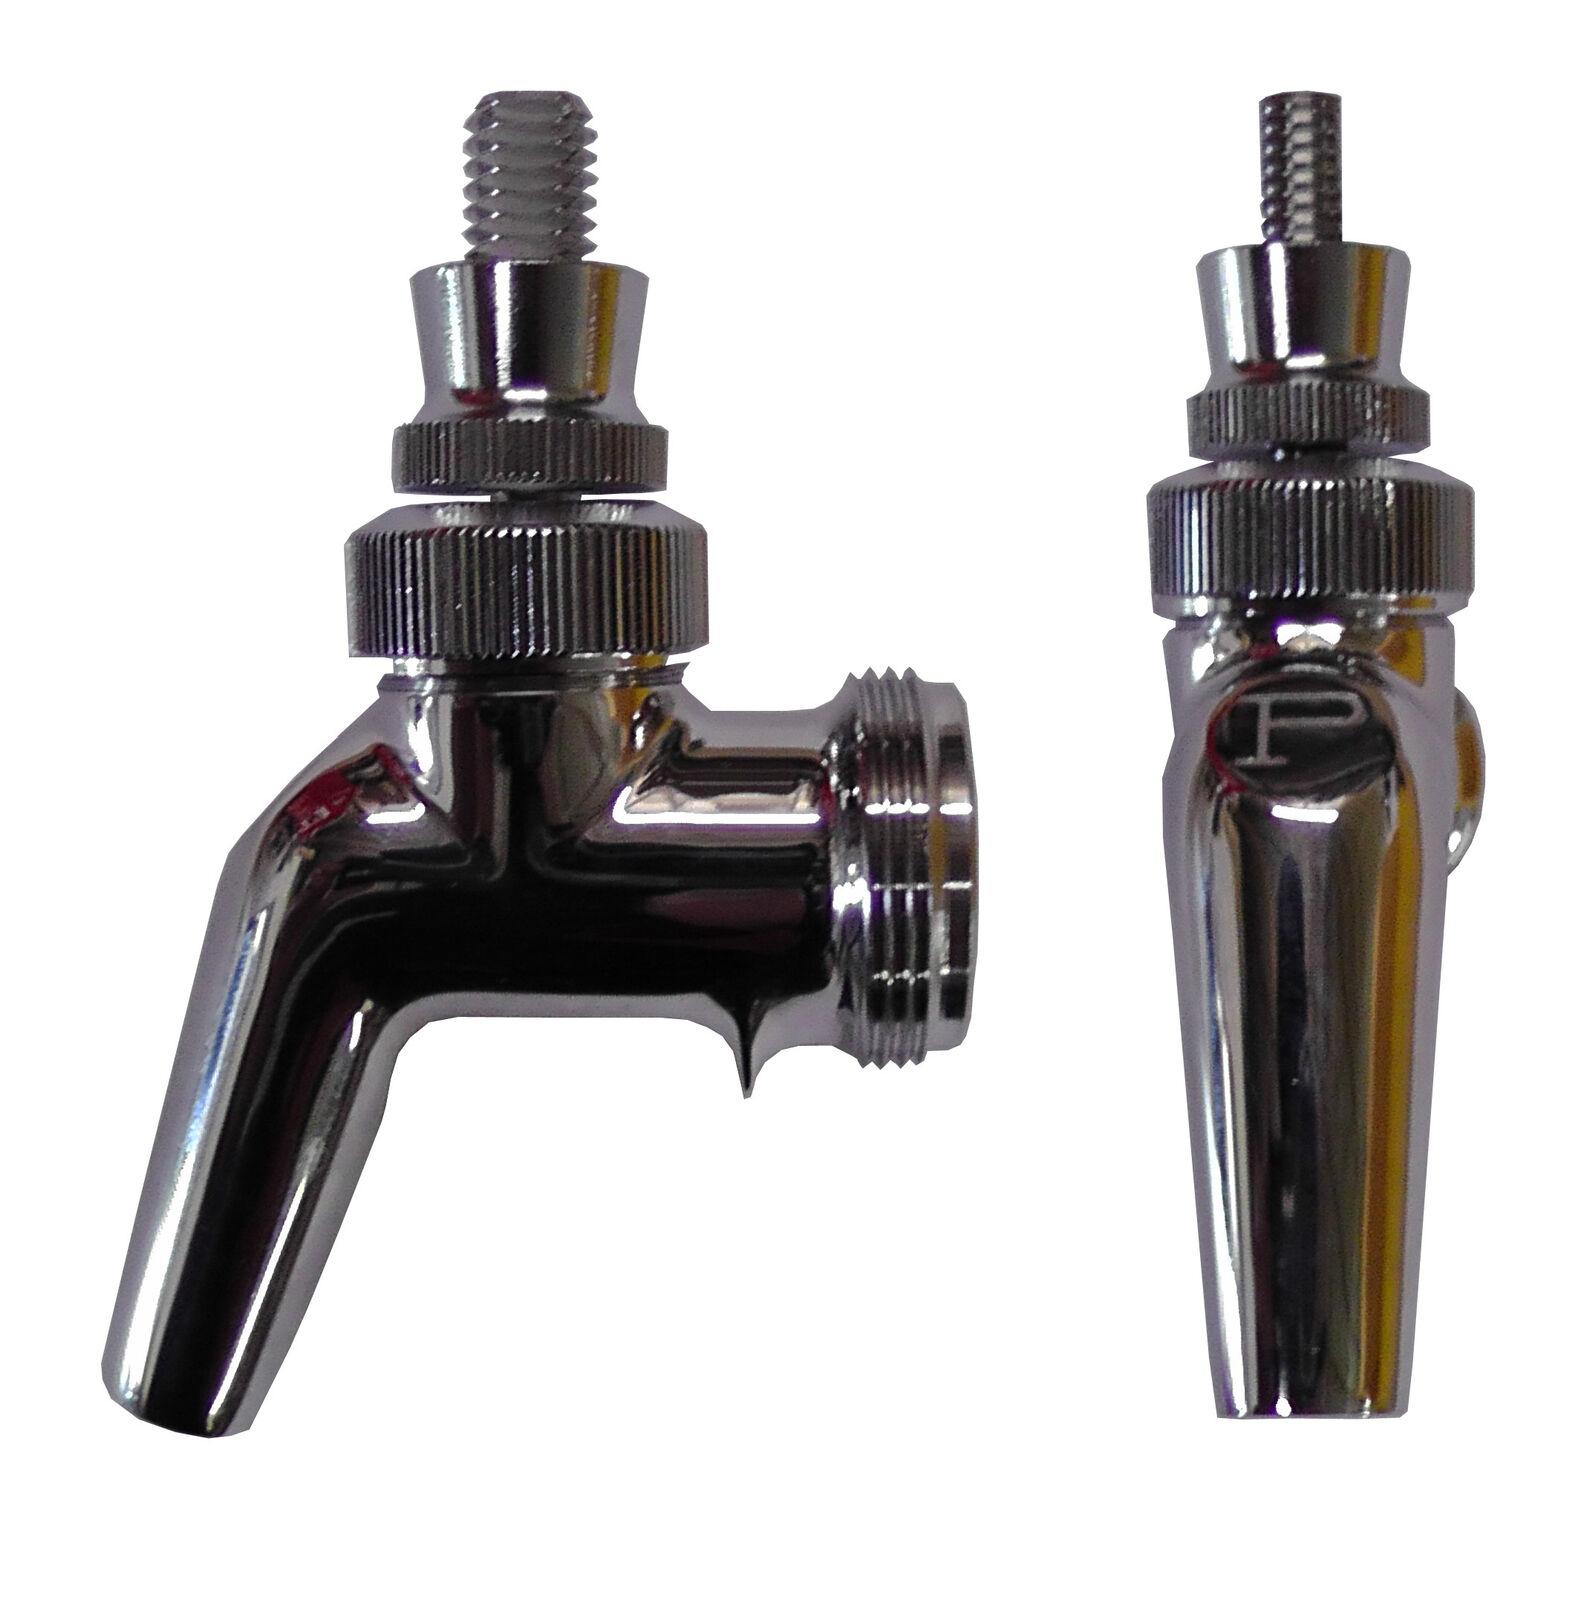 Perlick 630SS Stainless Steel Draft Beer Faucet | eBay